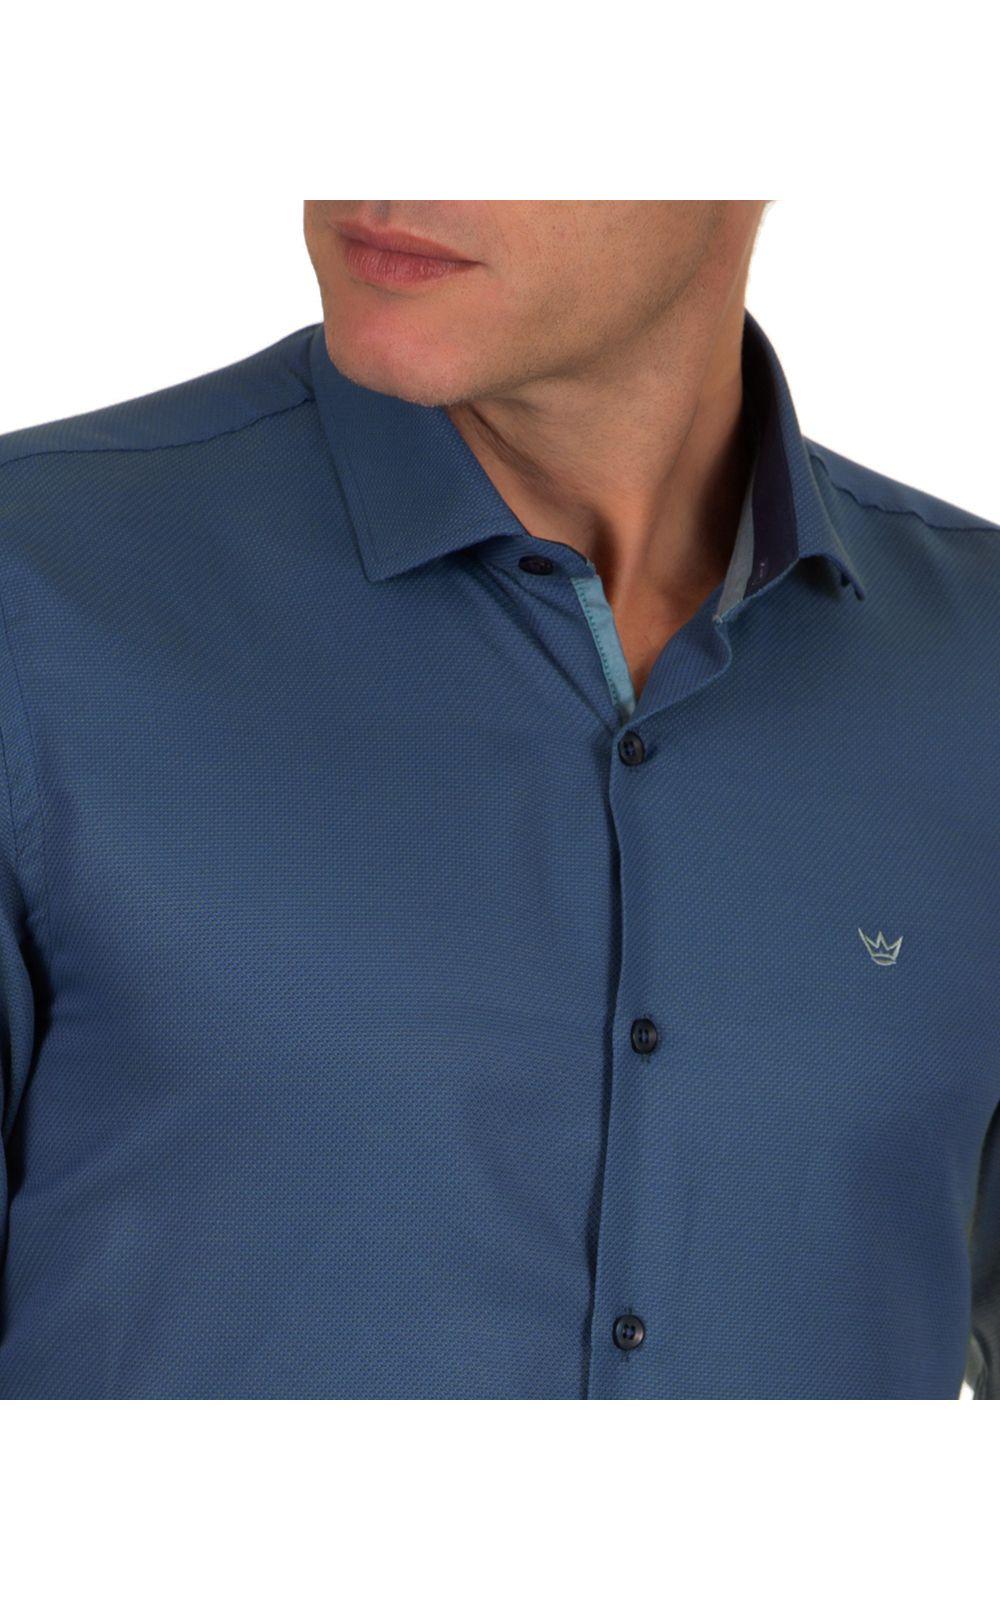 Foto 3 - Camisa Social Masculina Azul Escuro Lisa